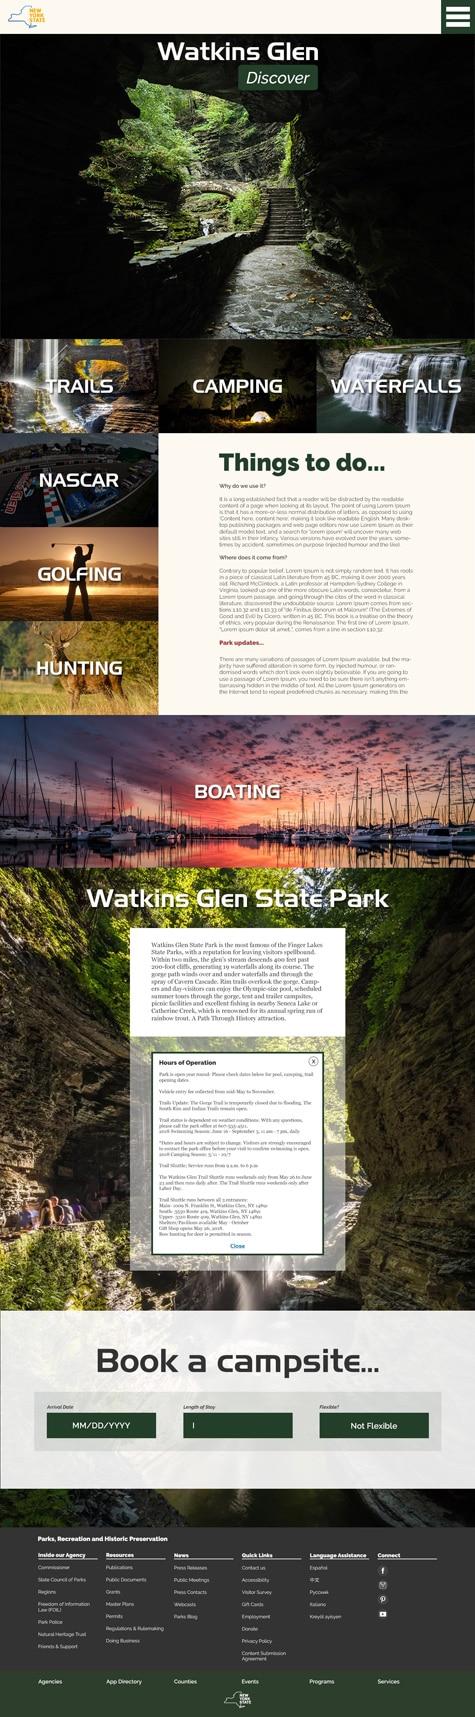 7 Photoshop Web Design Projects 6